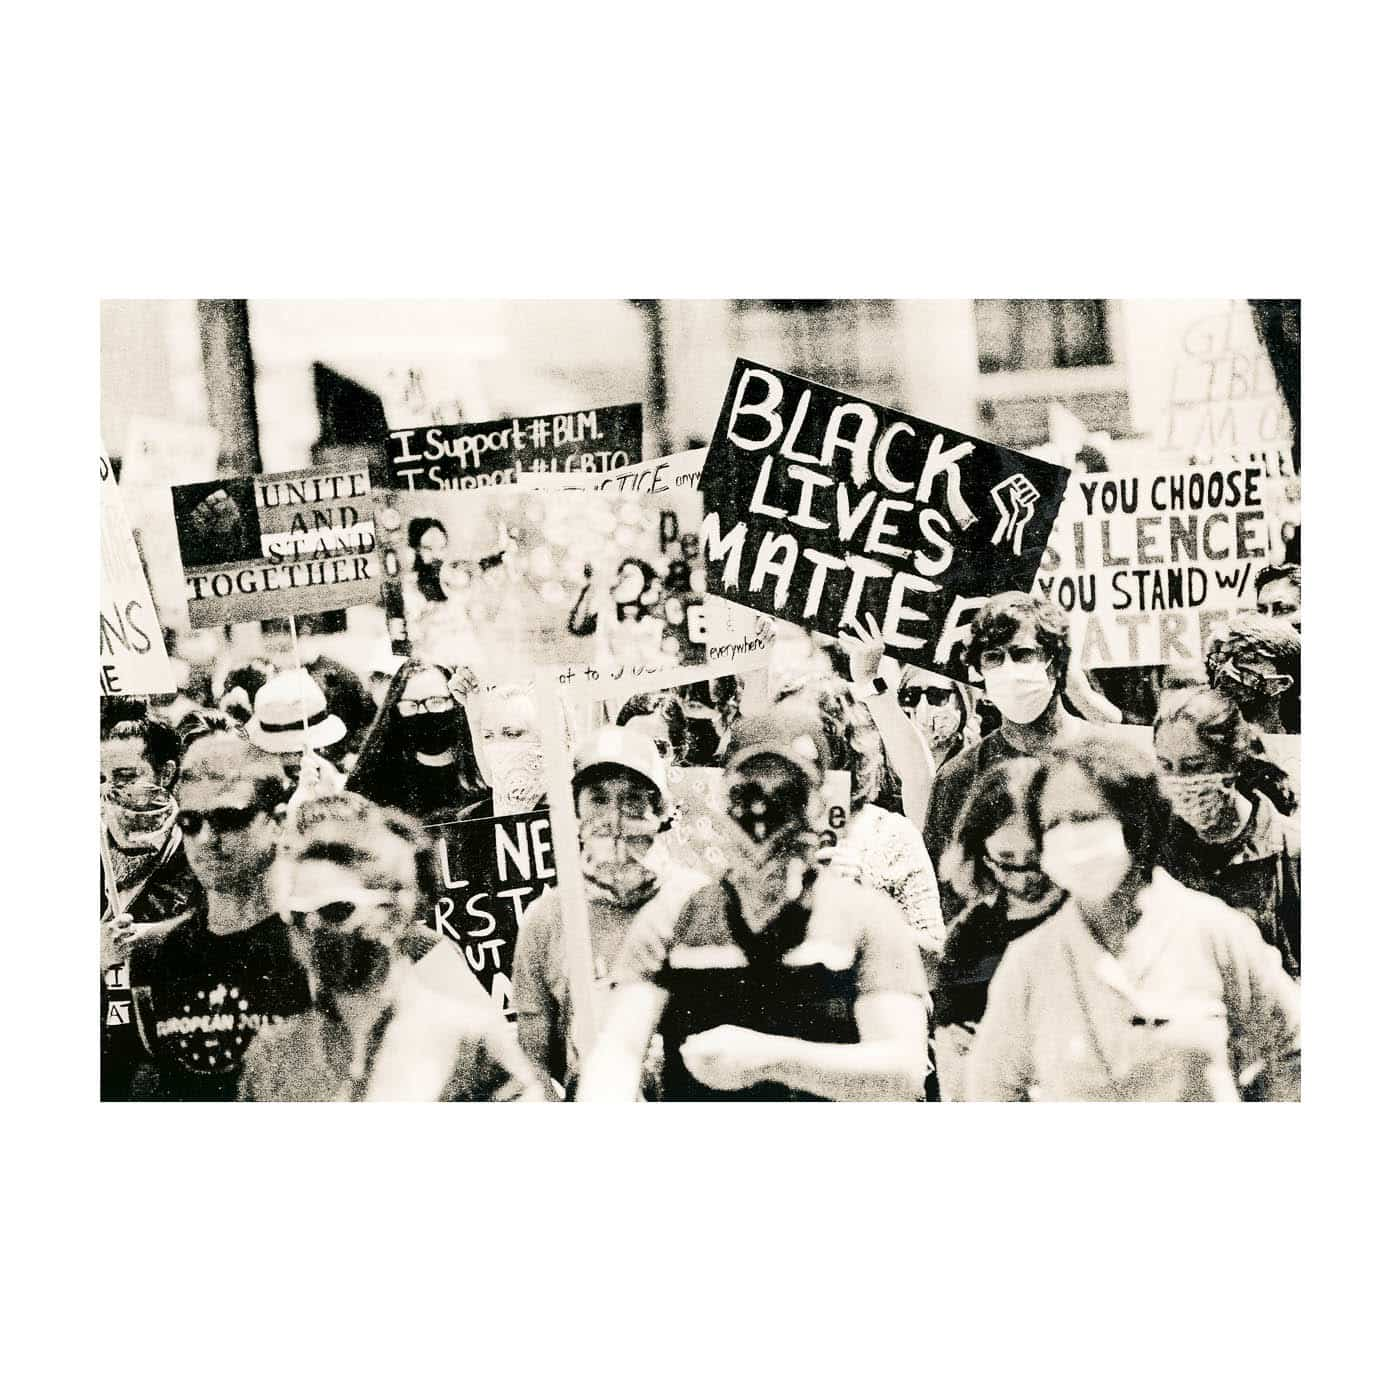 Lith print on Ilford MGWT Fiber Based Paper - Black lives matter protest